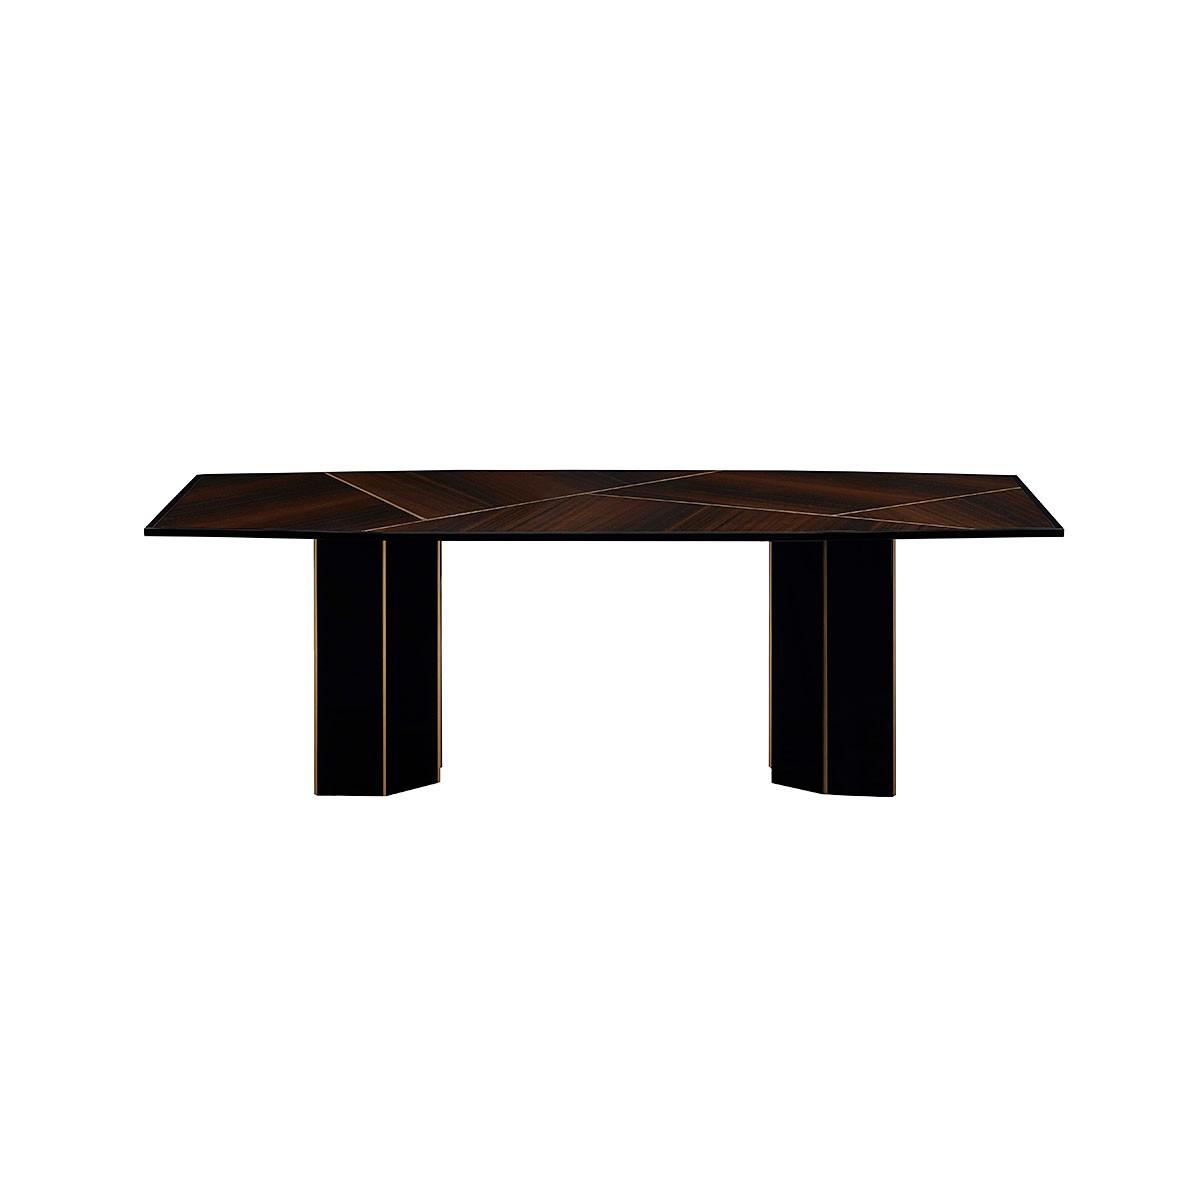 The Gaspar Dining Table